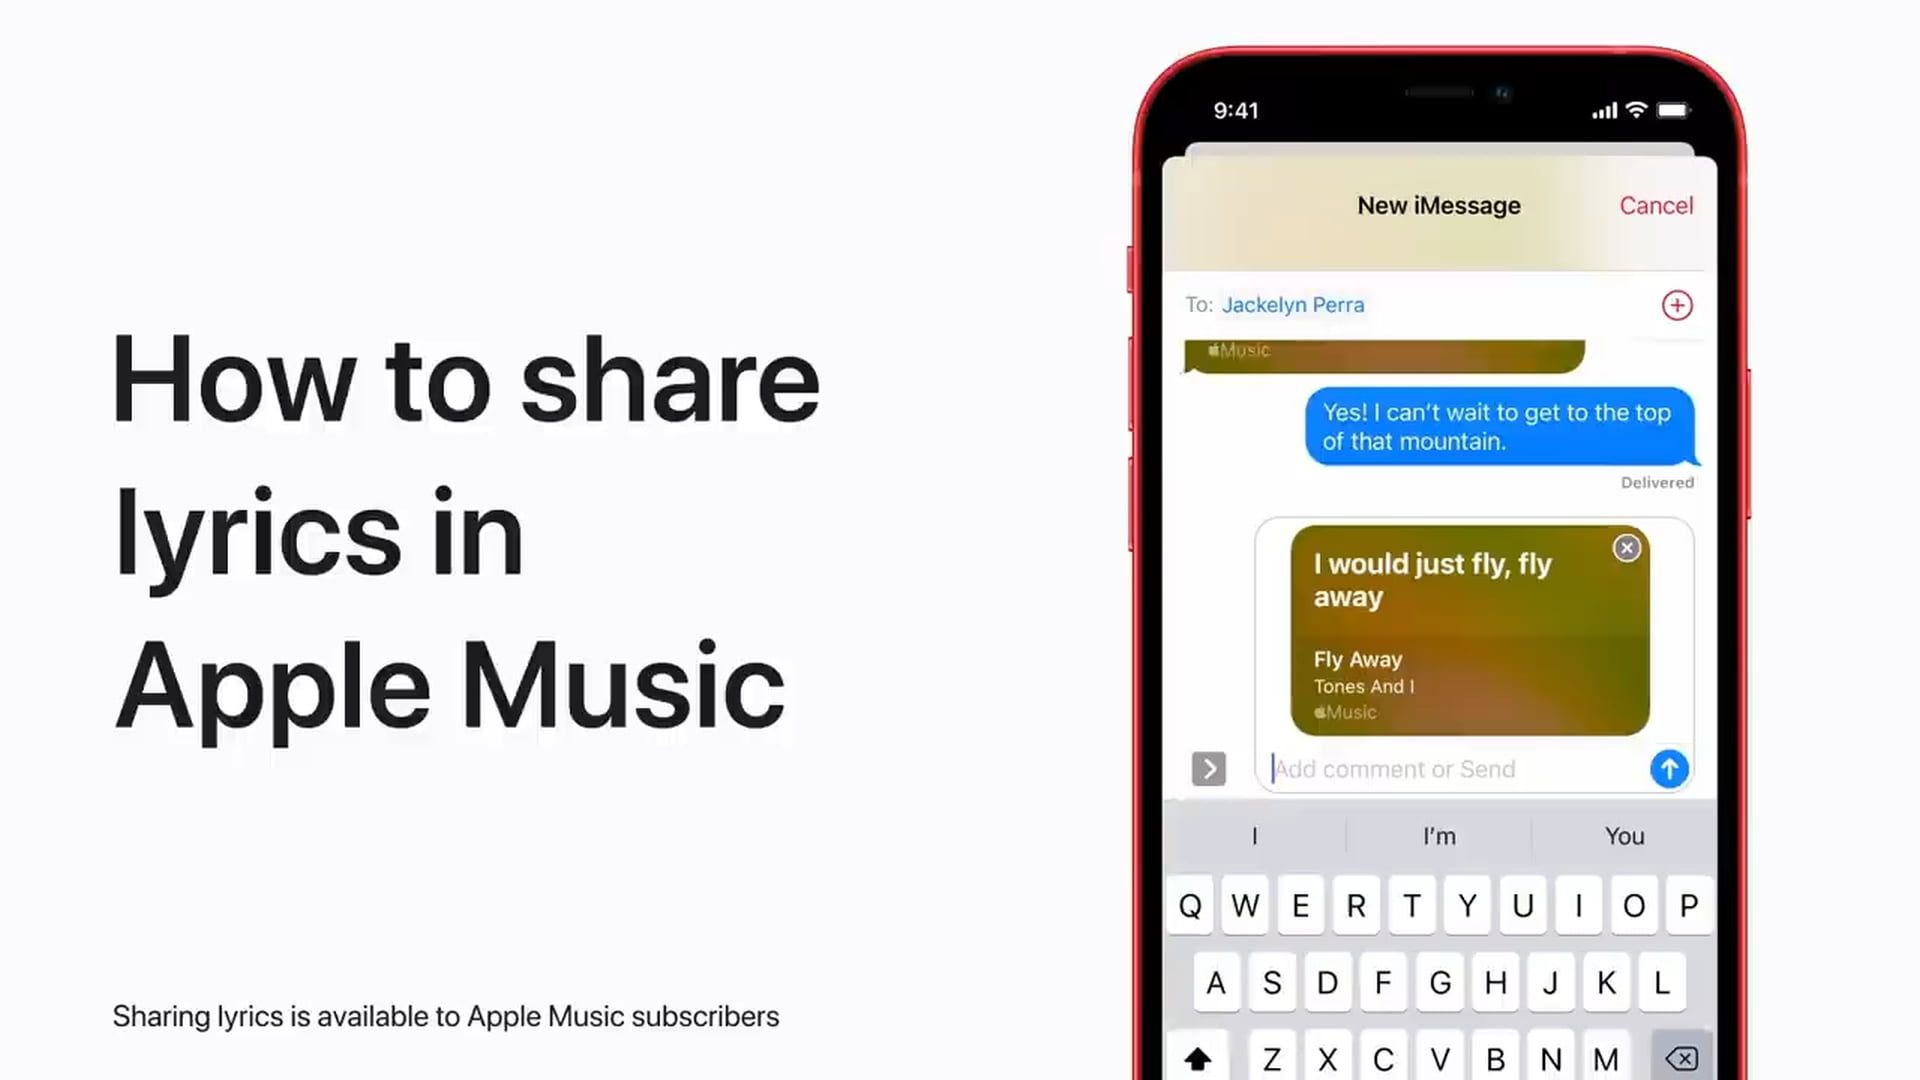 Poradnik Apple: Jak udostępniać teksty piosenek z Apple Music